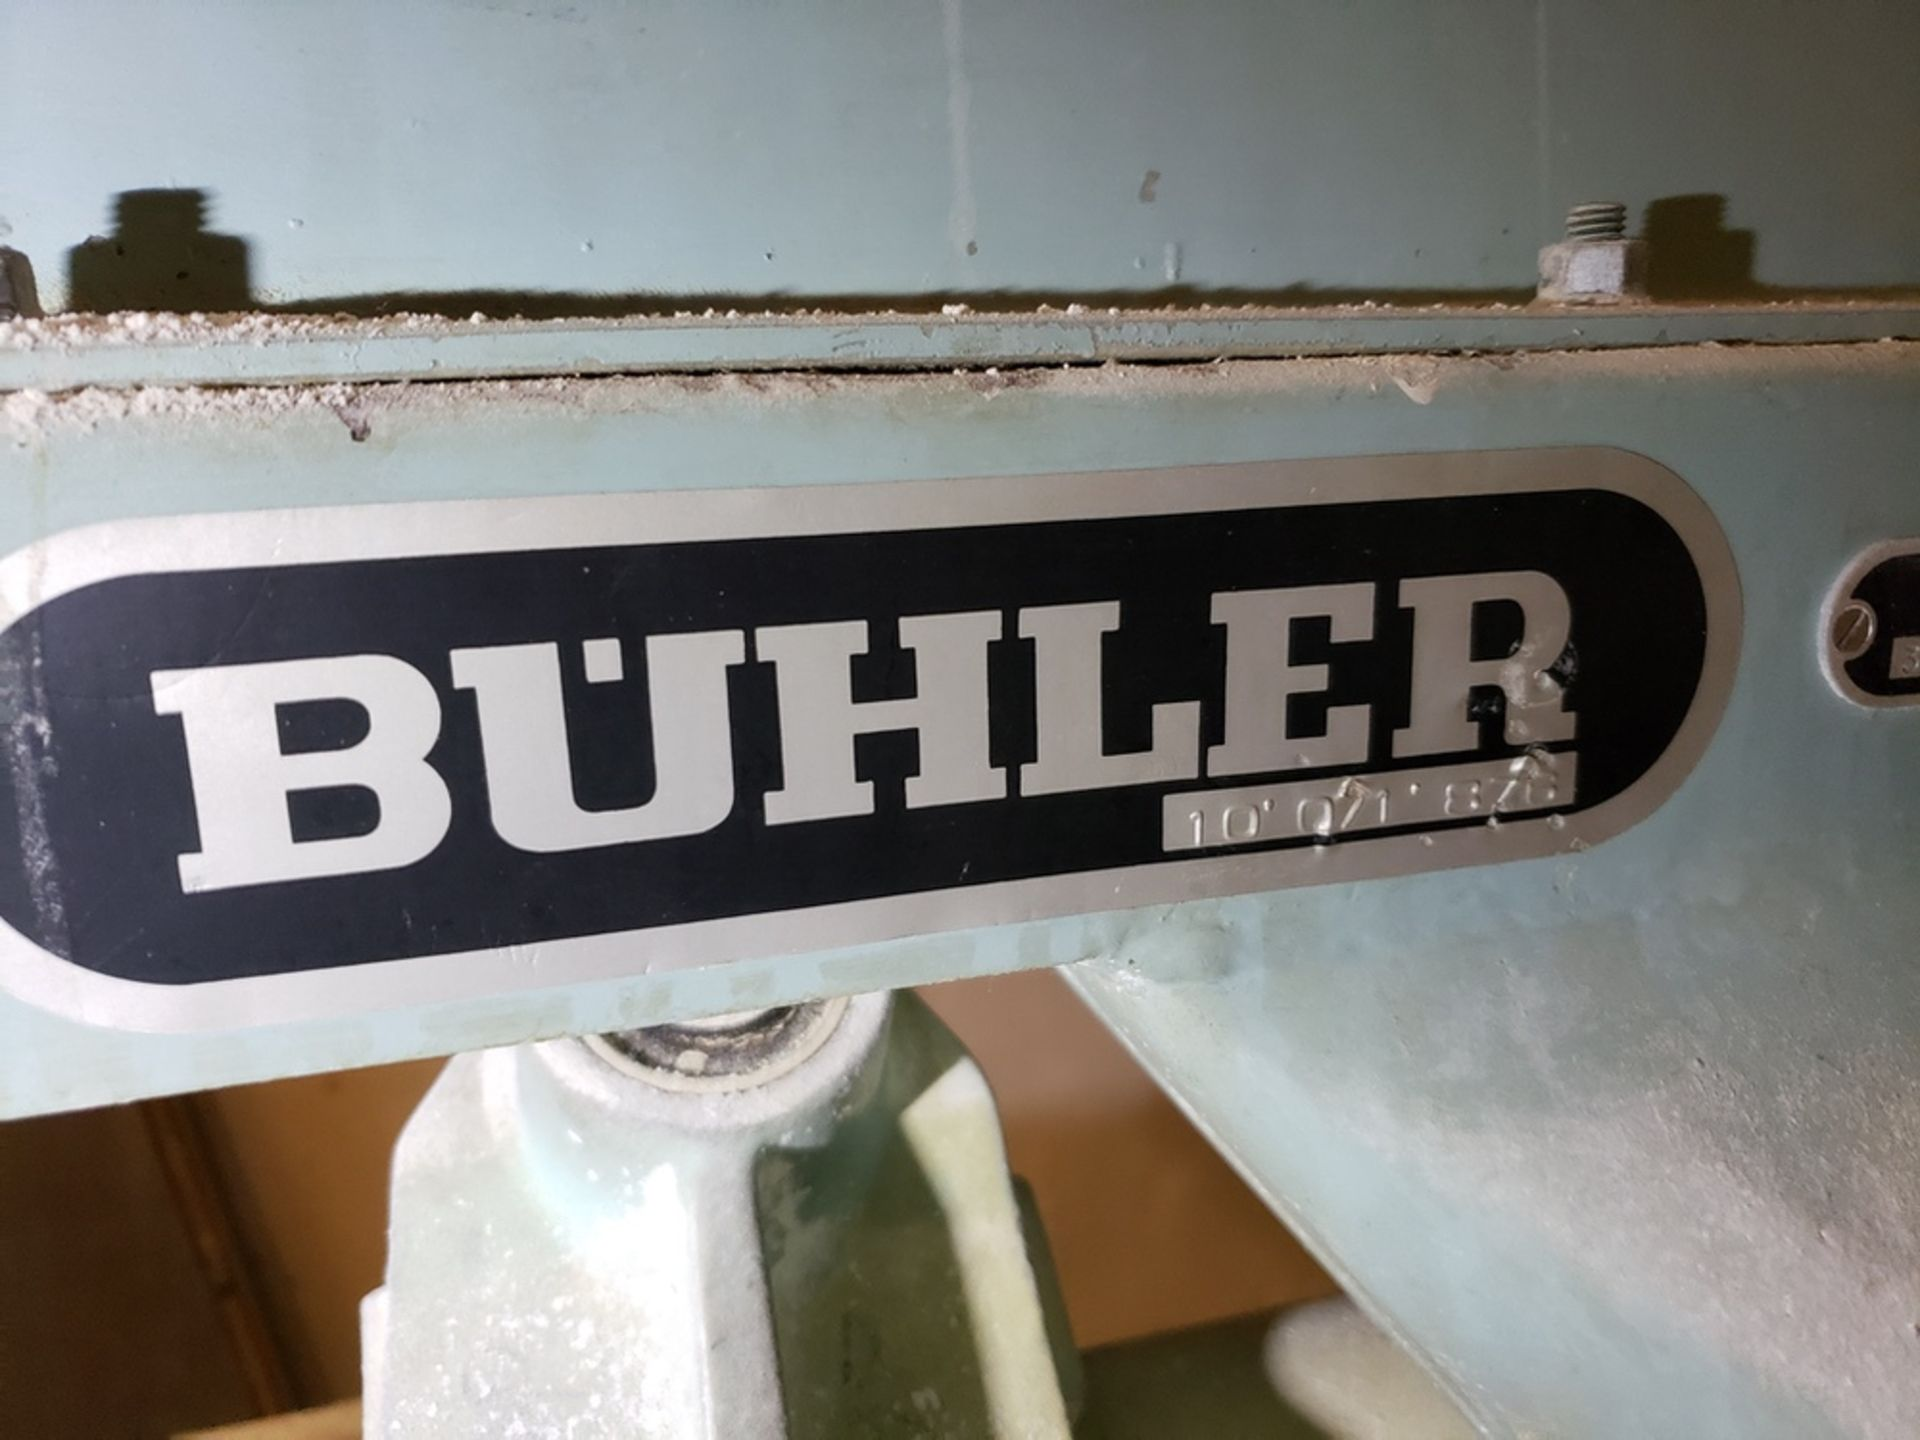 Lot 438 - Buhler De-Stoner, S/N 10-071-876 | Rig Fee: $700